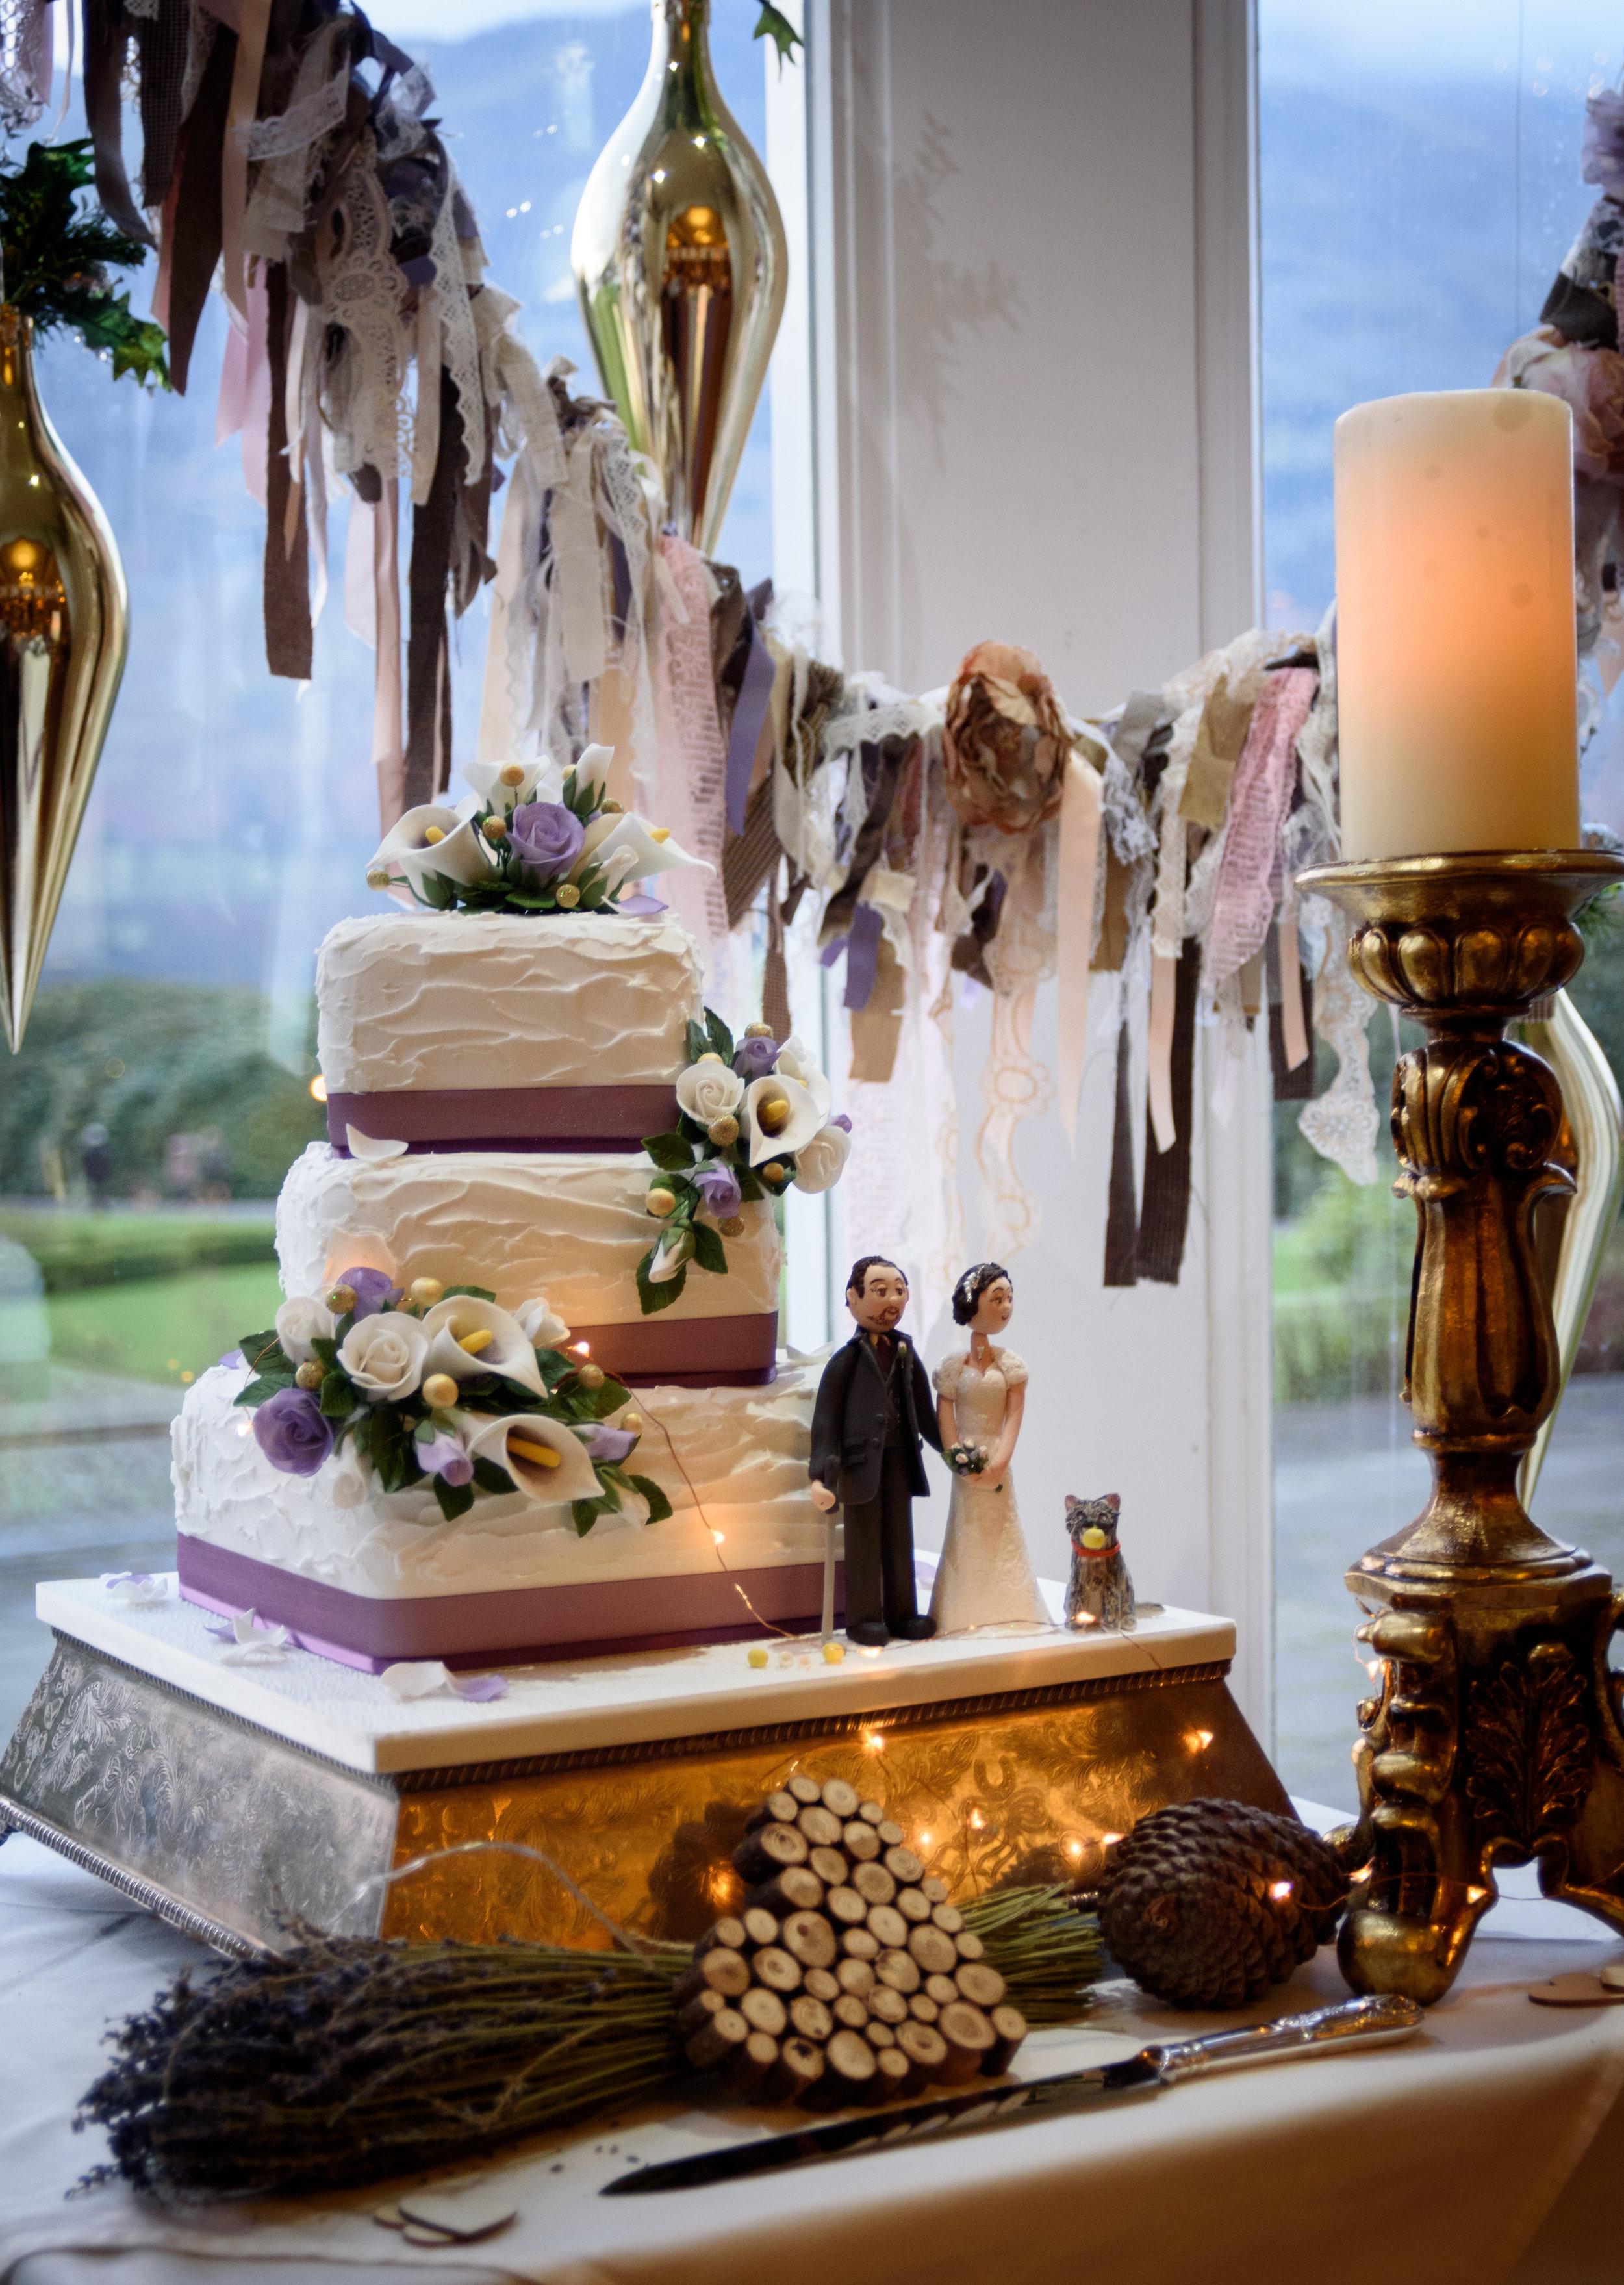 Room decoration and wedding cake